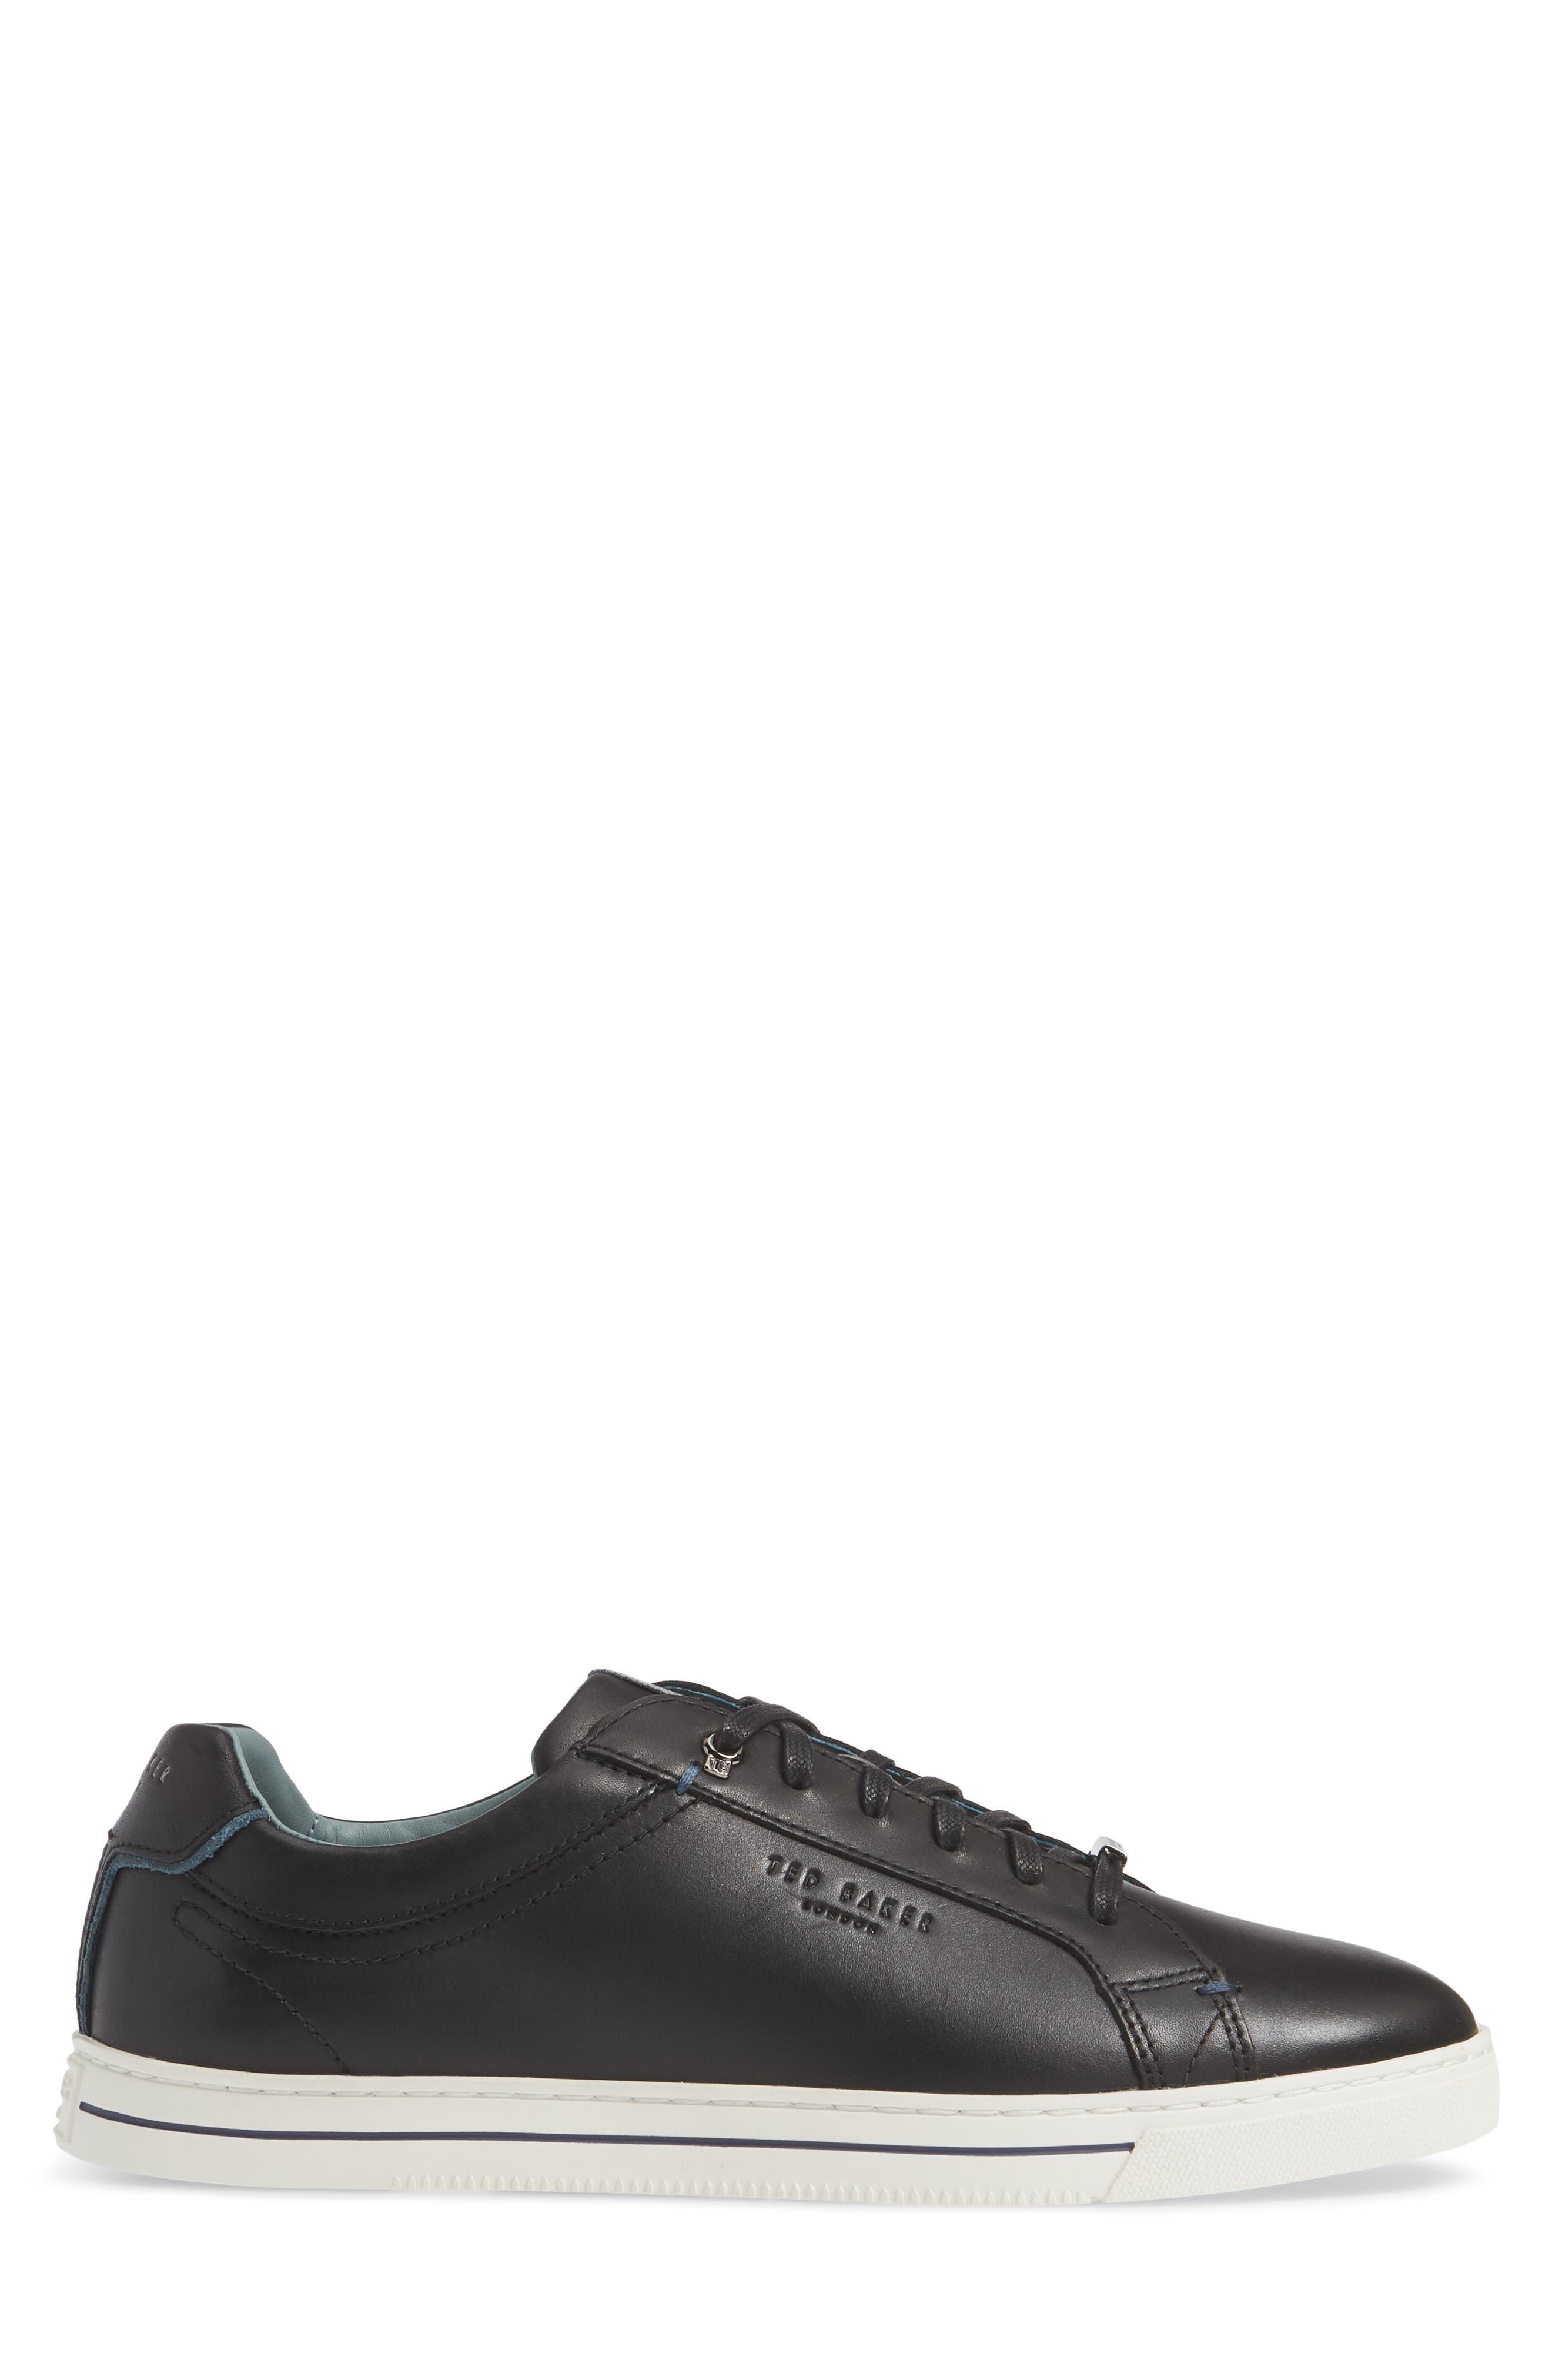 TED BAKER LONDON,                             Thawne Sneaker,                             Alternate thumbnail 3, color,                             BLACK LEATHER